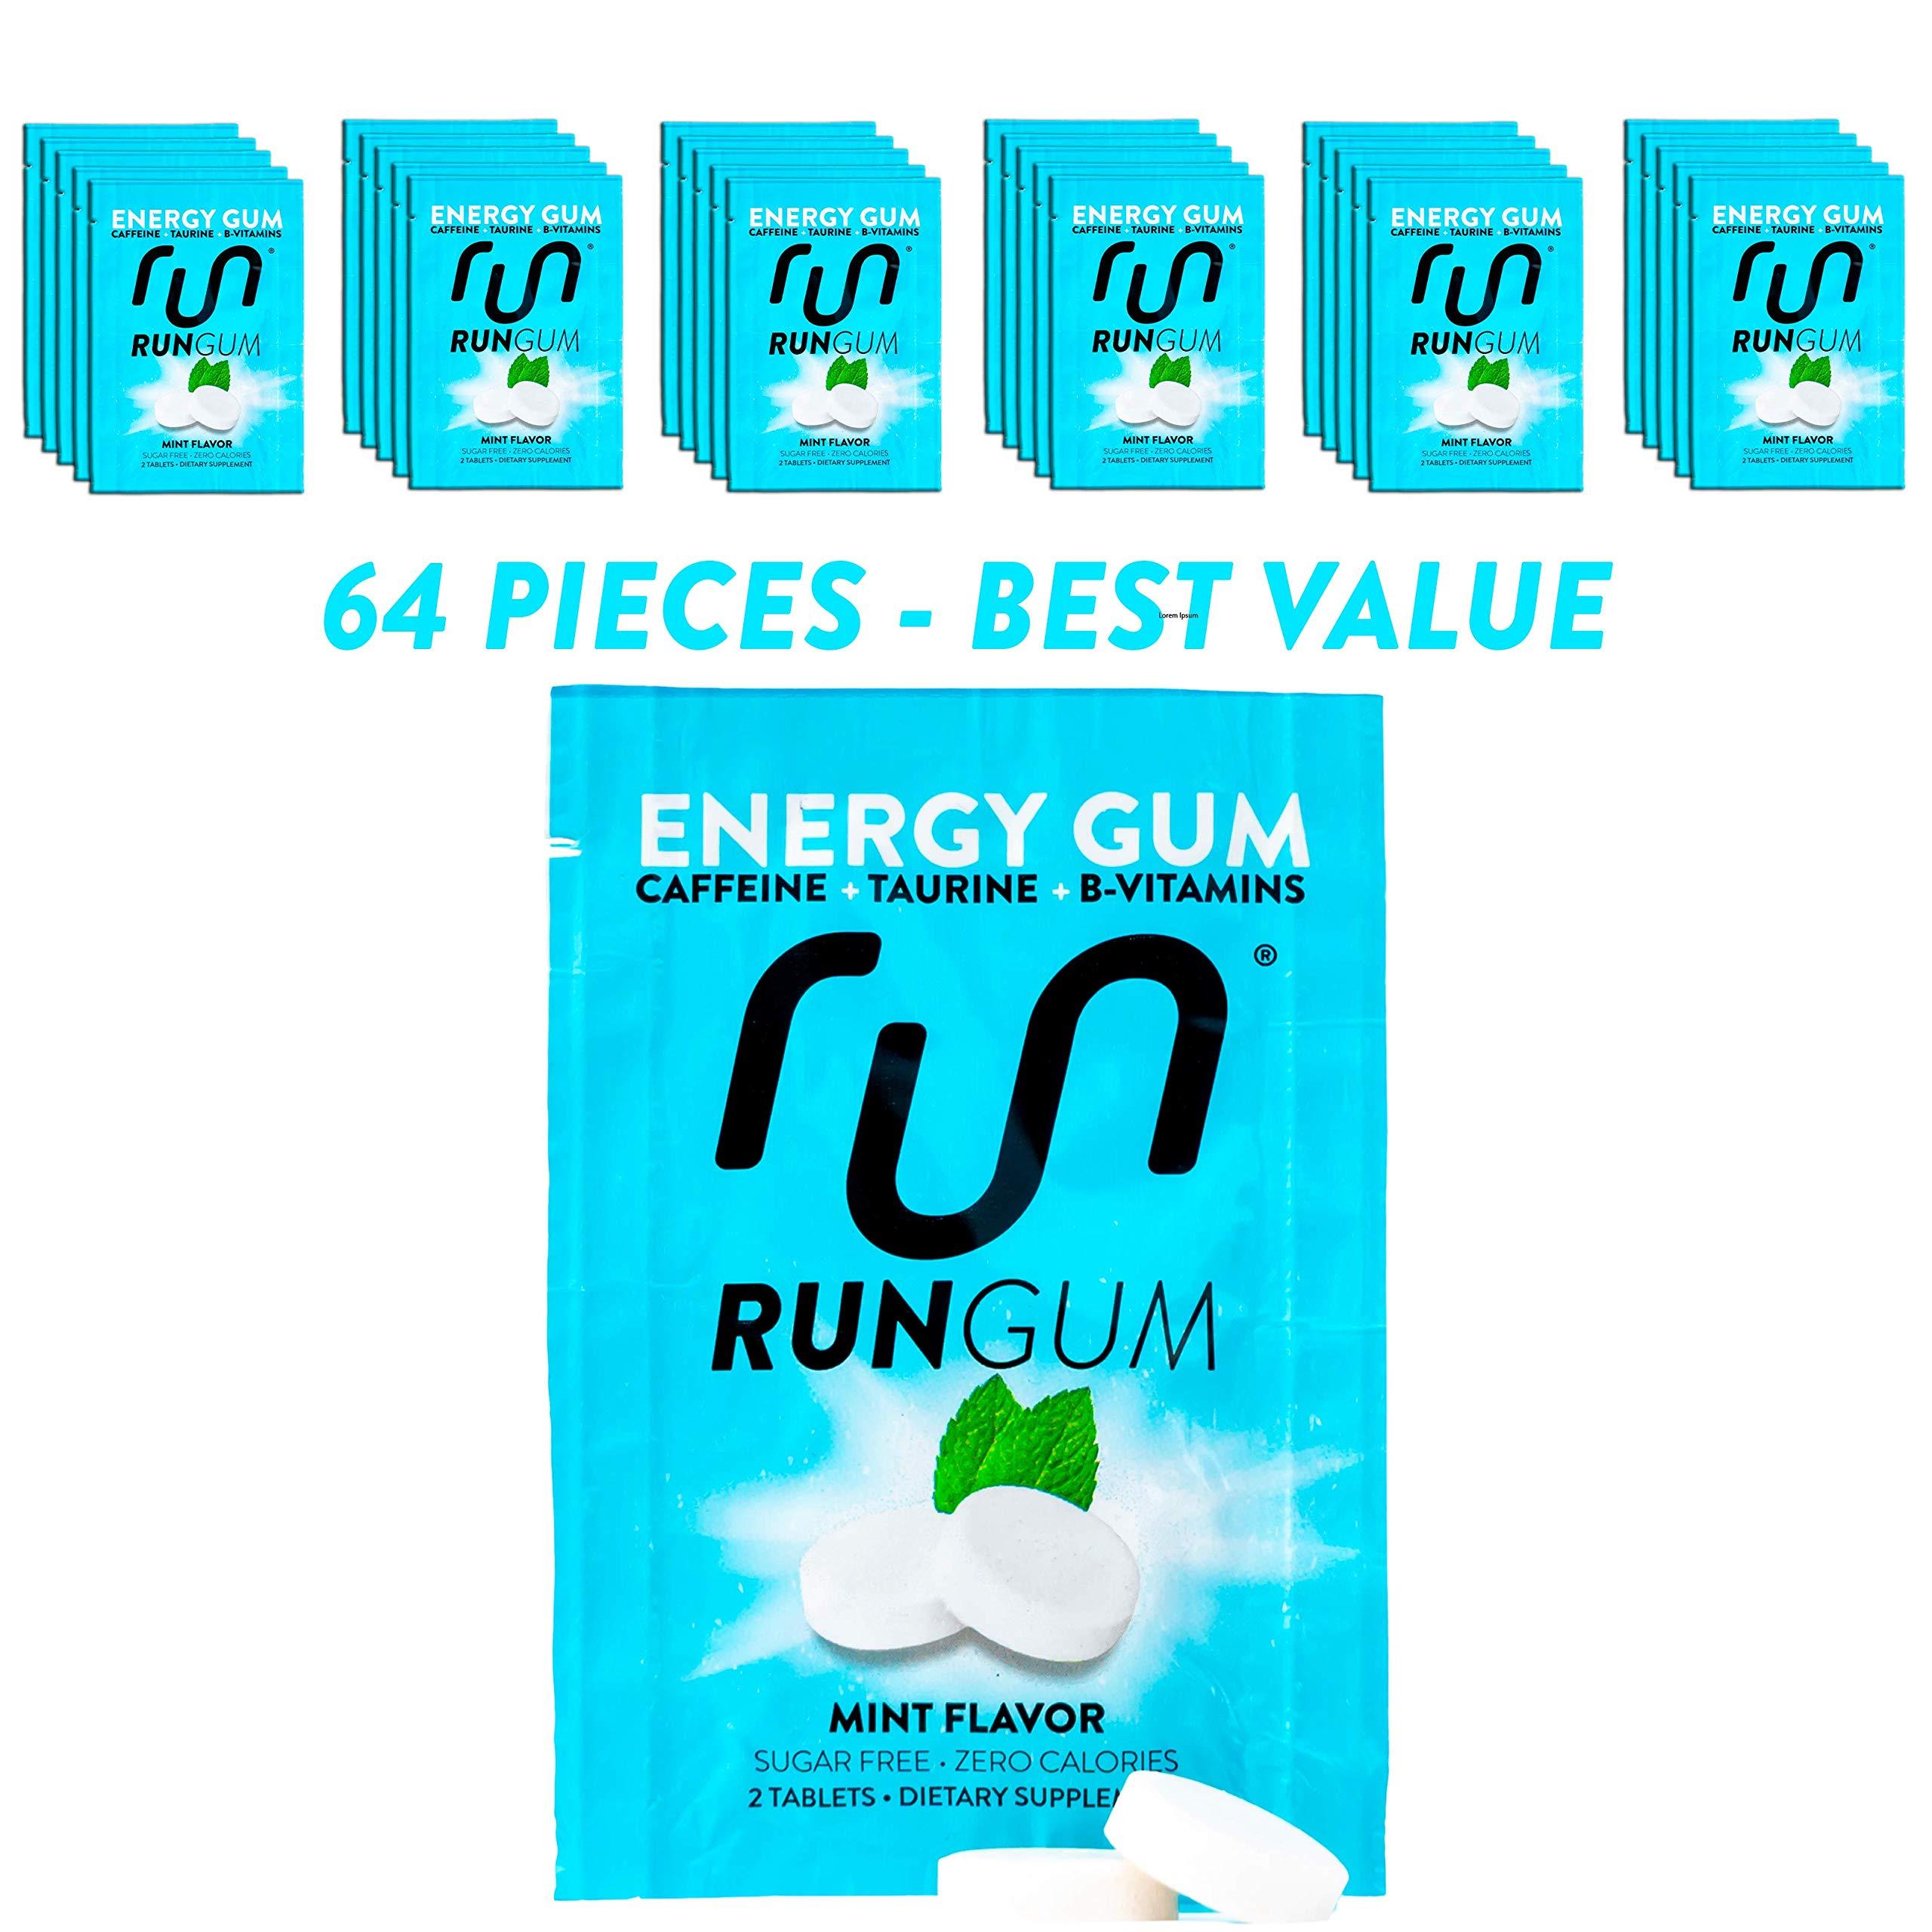 RUN GUM Mint Energy Chewing Gum 50mg Caffeine Taurine & B-Vitamins 64 Pieces (32pk) Best Value